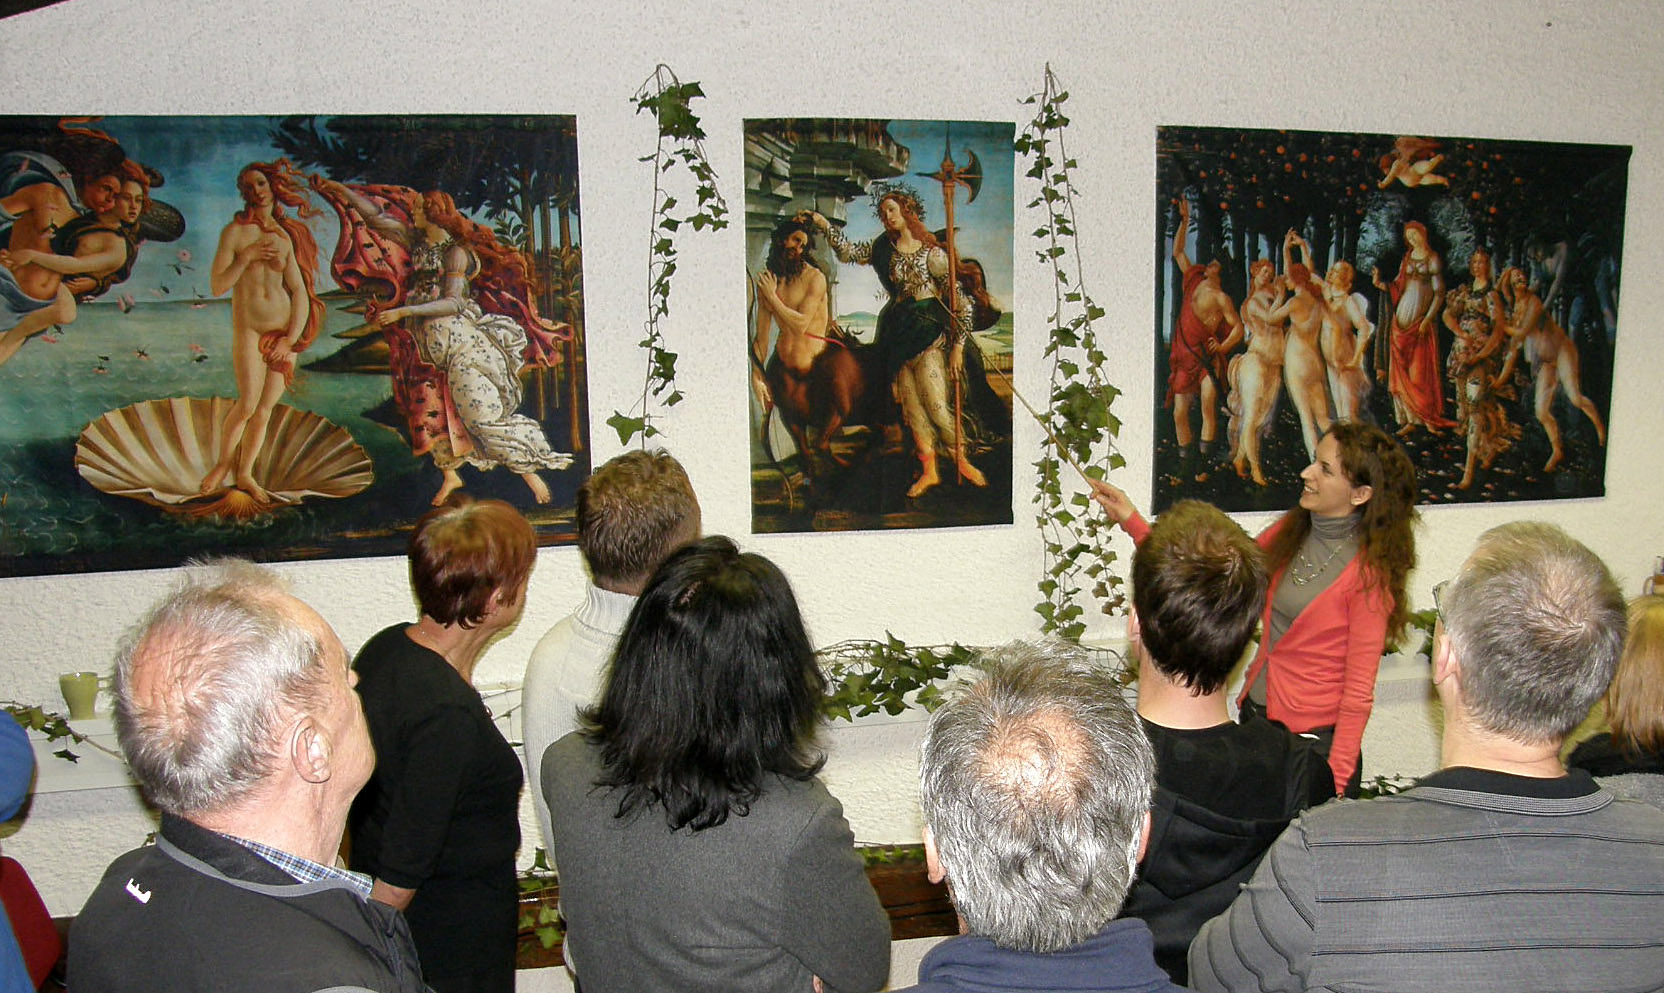 Renaissance Philosophy Through Symbolism In Art Slovenia